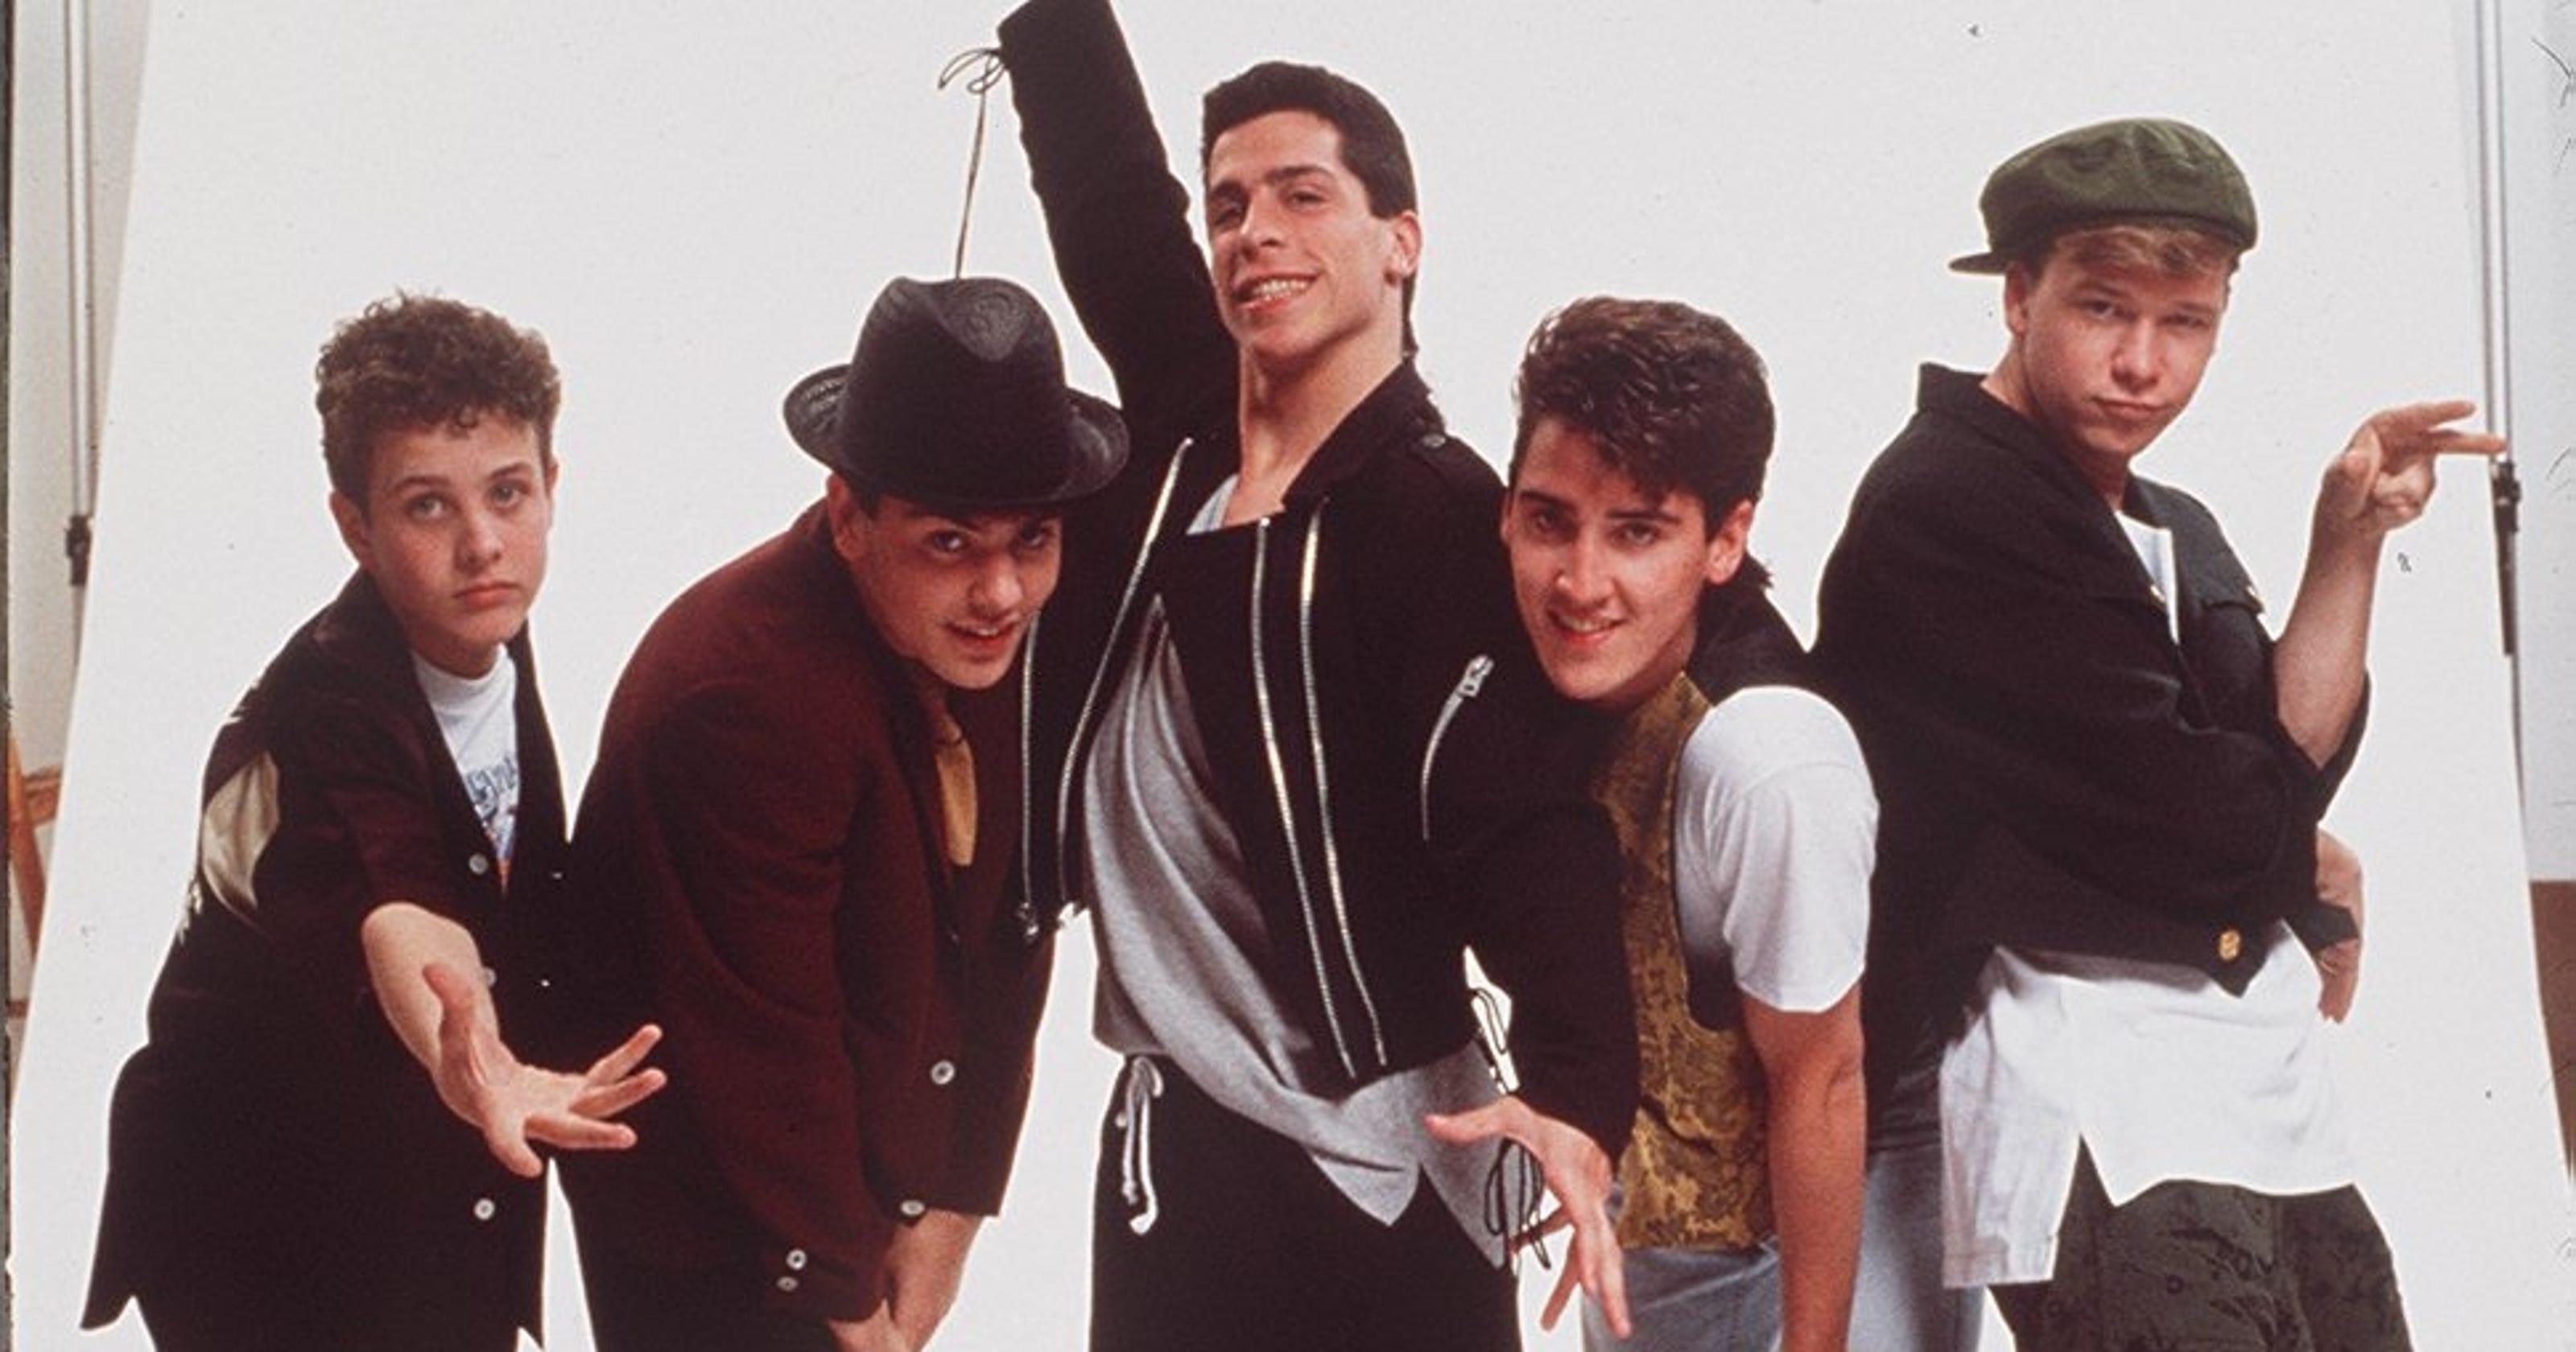 98 Degrees, Boyz II Men join New Kids on the Block tour